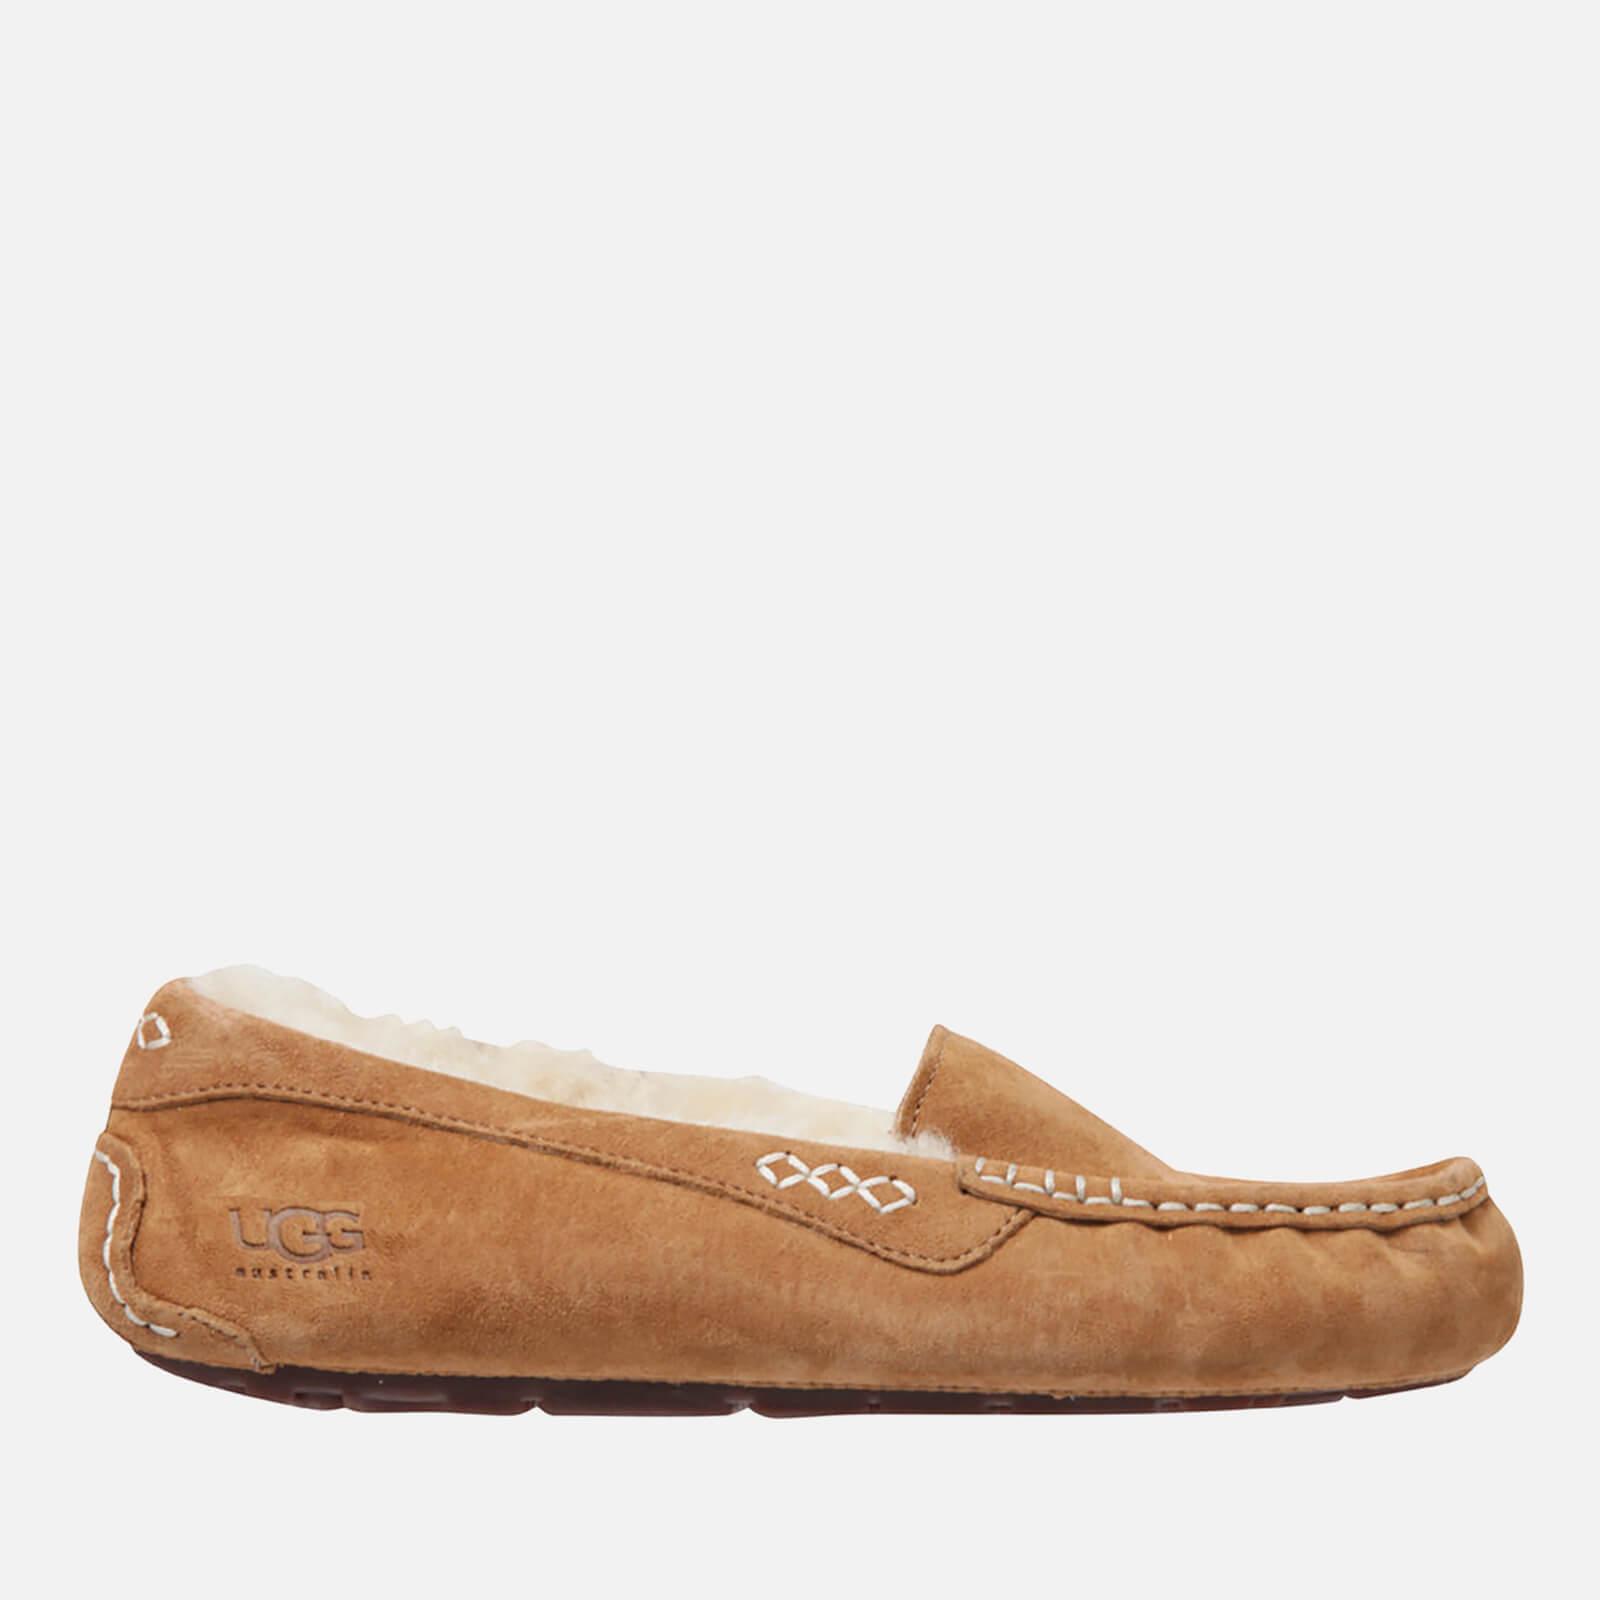 UGG Women's Ansley Moccasin Suede Slippers - Chestnut - UK 7